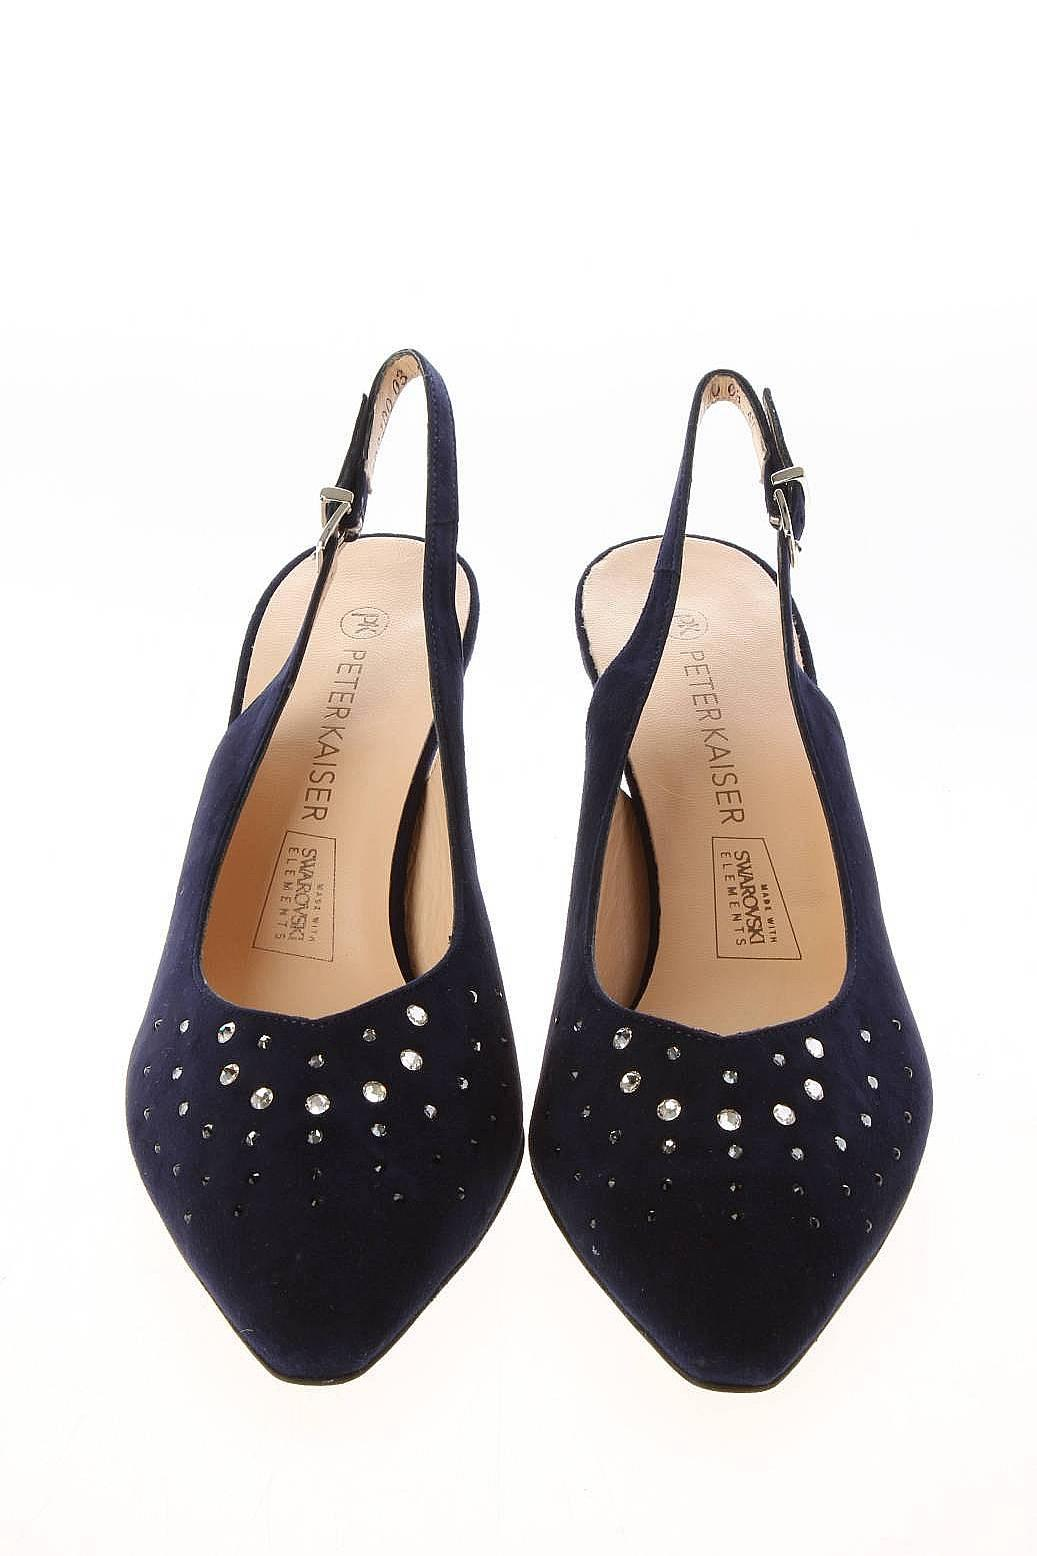 Мужская Обувь Детская Обувь Женская Обувь Туфли Открытые: Peter Kaiser Обувь